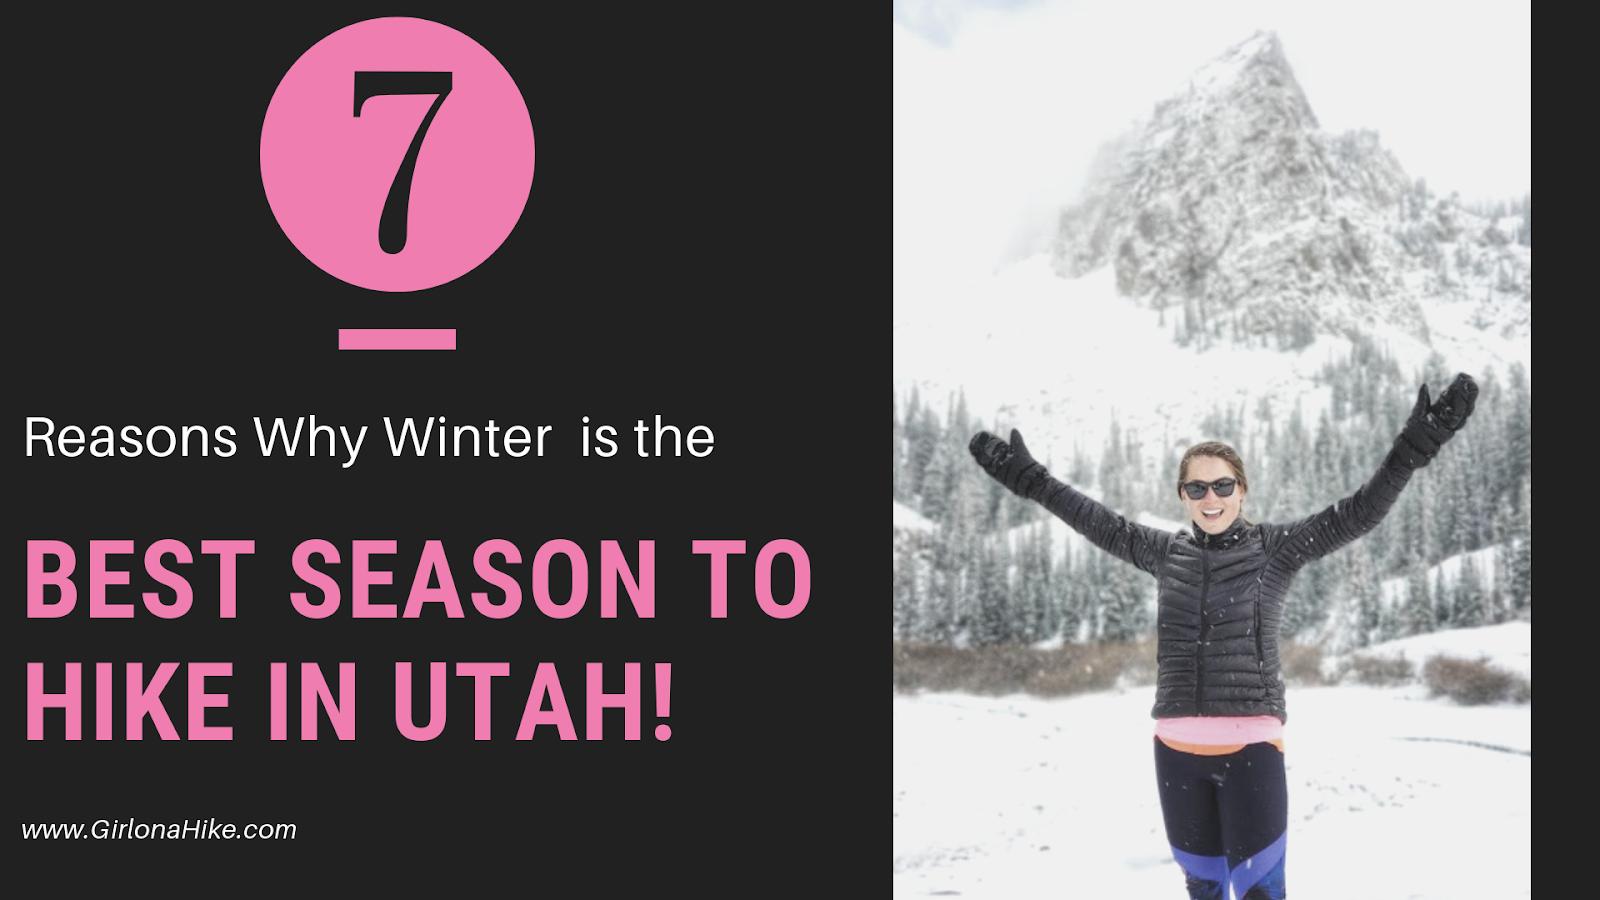 7 Reasons Why Winter is the Best Season to Go Hiking in Utah!